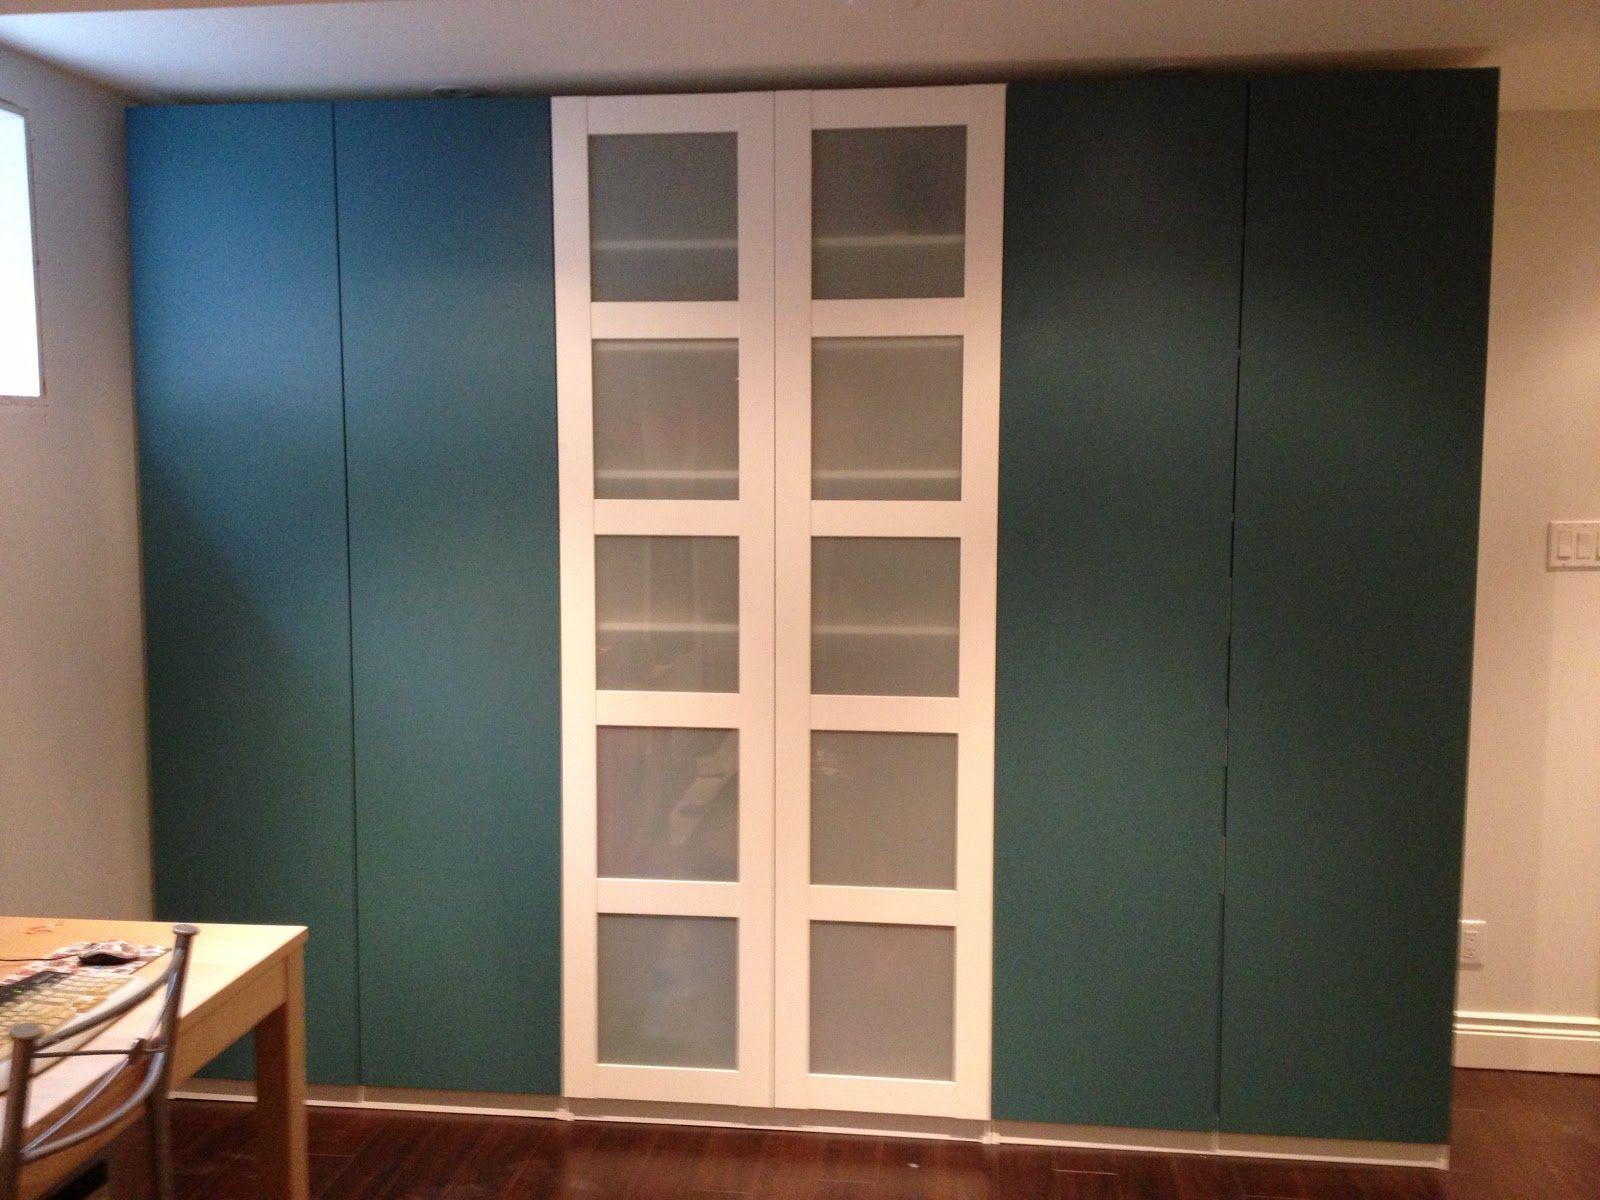 Ikea Master Bedroom ikea pax closet turquoise - master bedroom | bedroom | pinterest